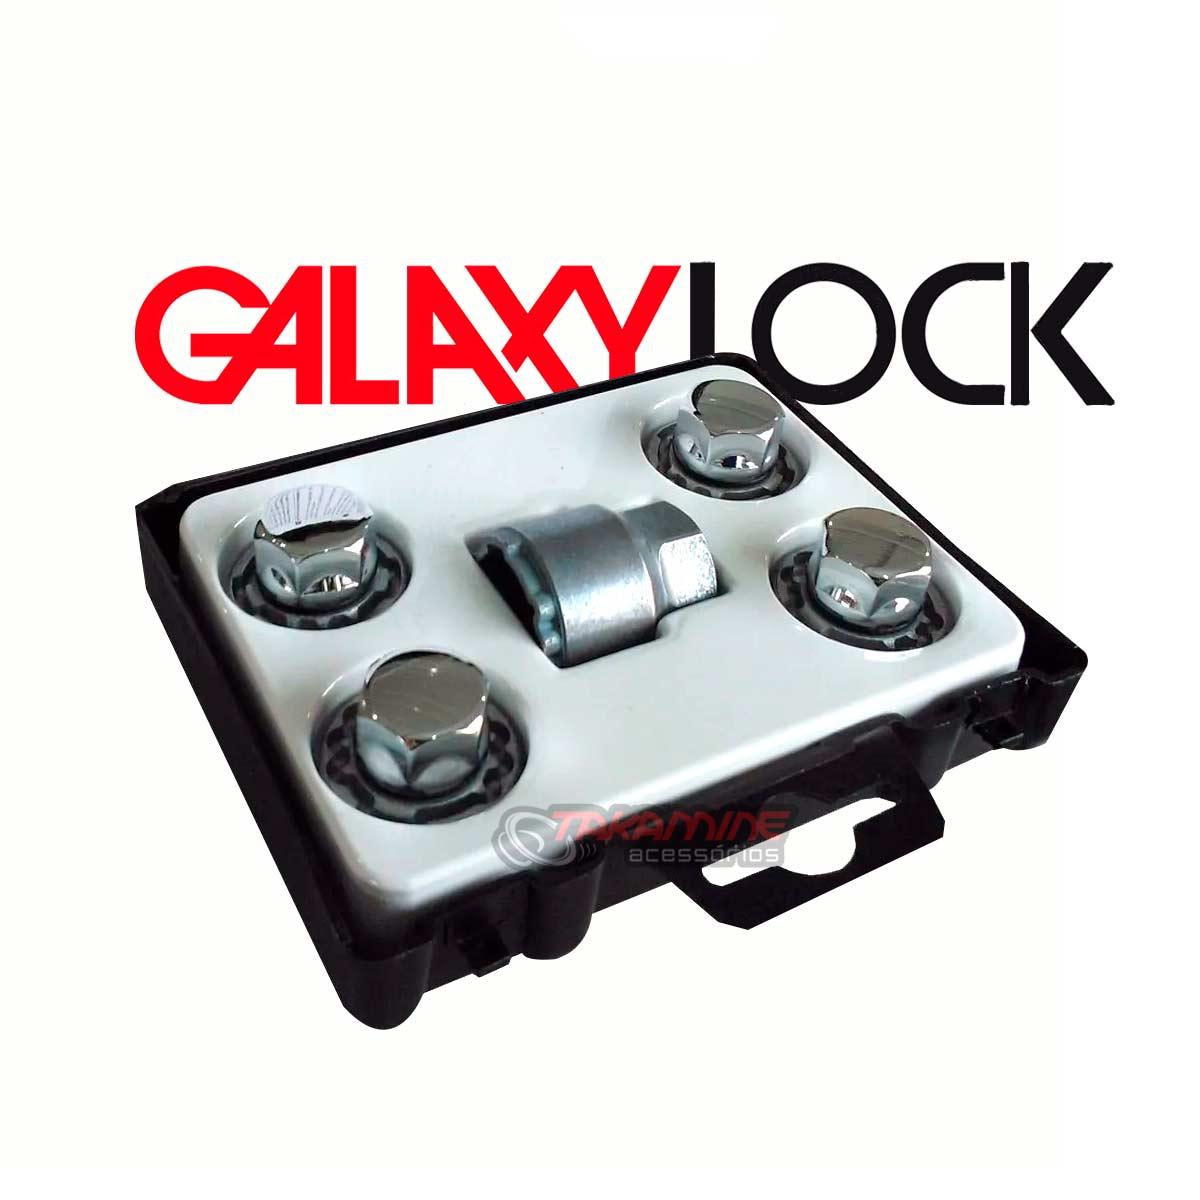 Parafuso antifurto para rodas Galaxy Lock Golf 1995 até 2020 ZA/M